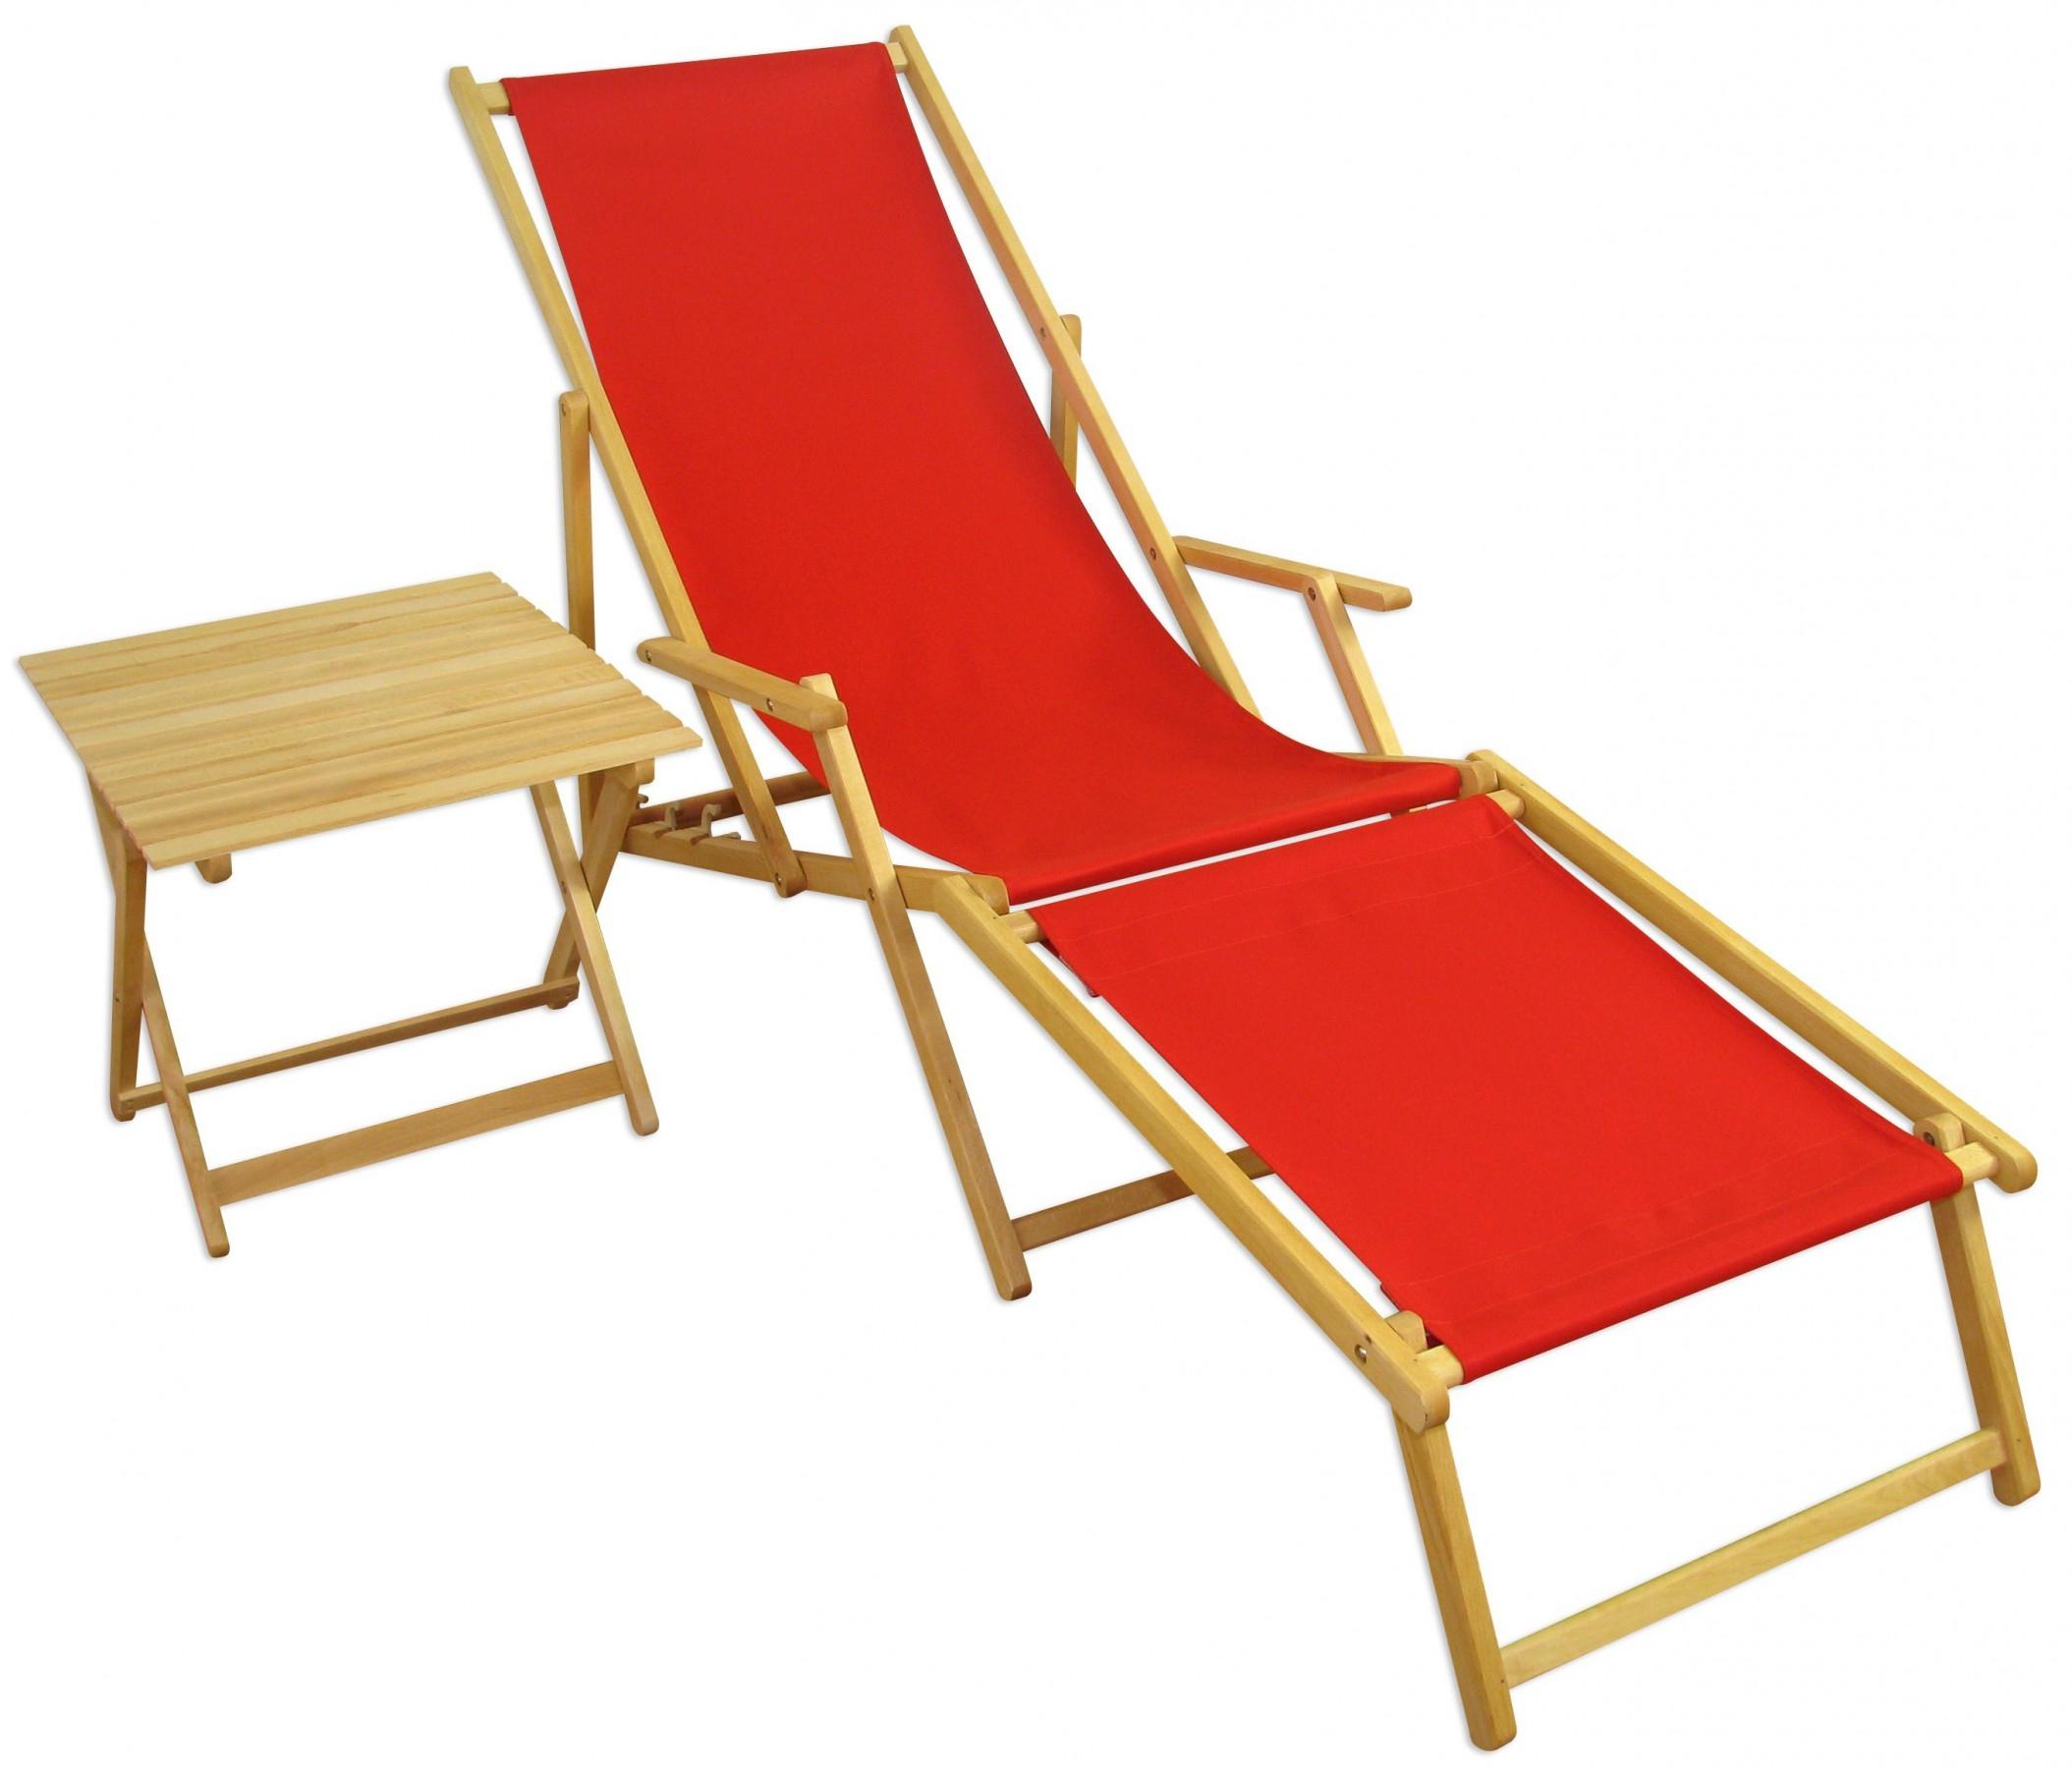 Full Size of Garten Liegestuhl Lidl Holz Klappbar Lafuma Alu Ikea Bauhaus Obi Küche Kosten Modulküche Sofa Mit Schlaffunktion Miniküche Betten Bei Kaufen 160x200 Wohnzimmer Ikea Liegestuhl